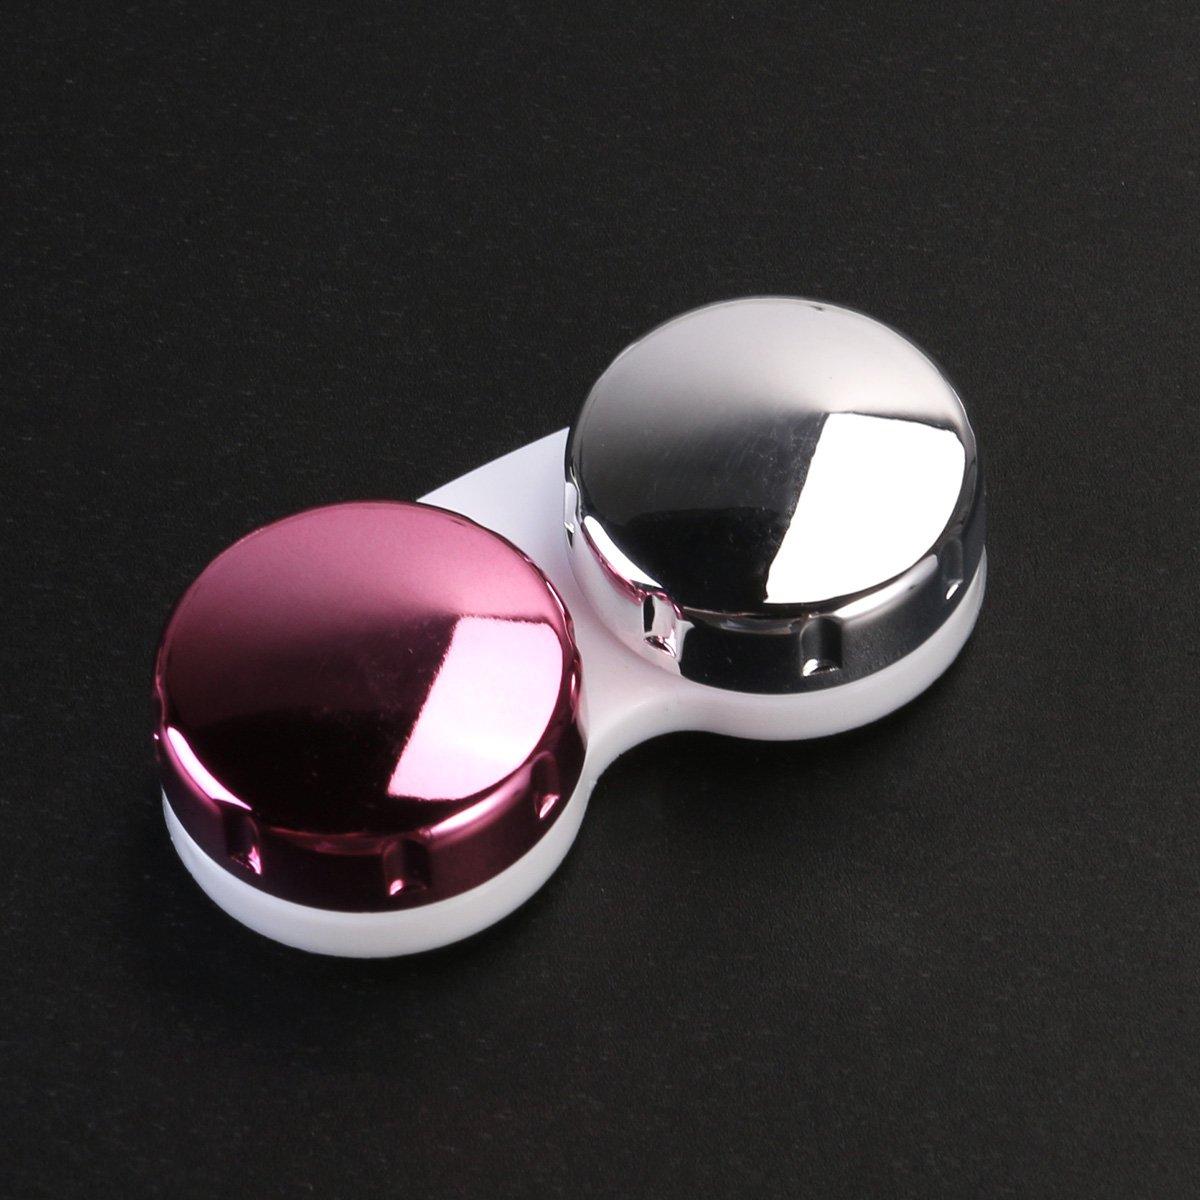 Amazon.com: ROSENICE Contact Lens Case Mini Travel Portable ...